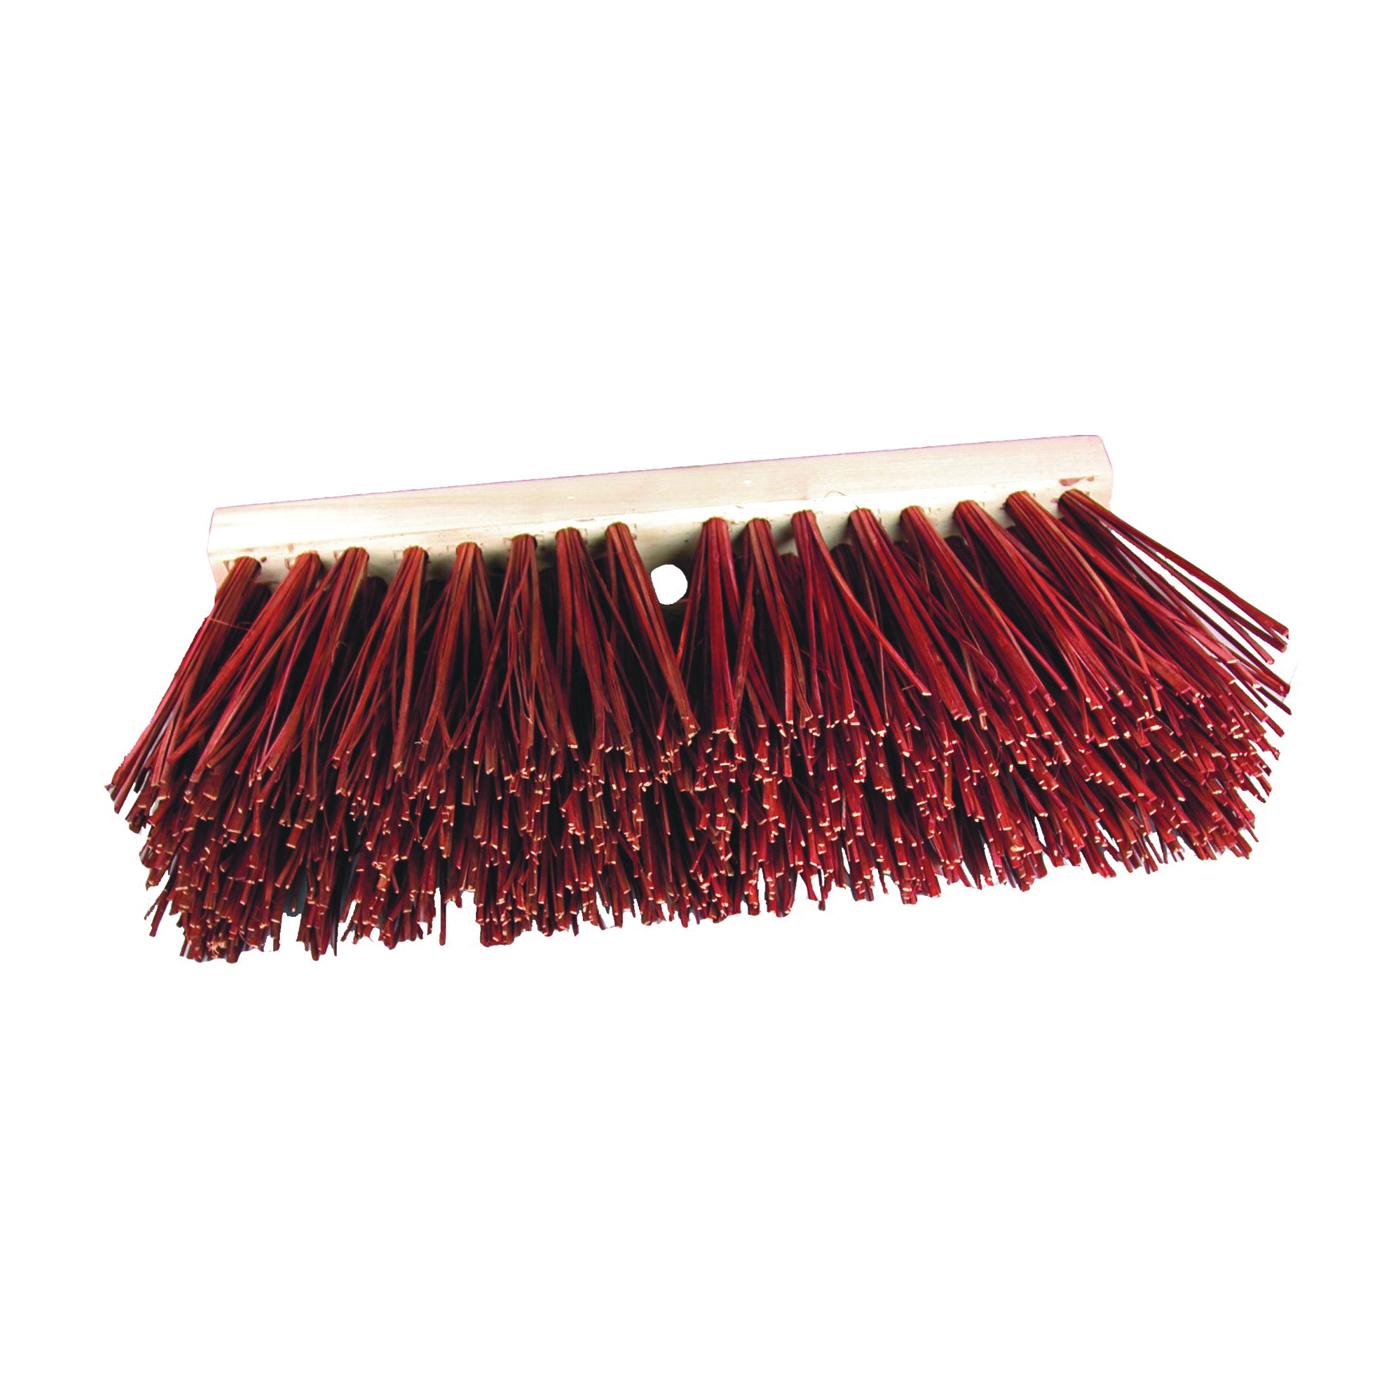 Picture of BIRDWELL 3016-6 Street Broom Head, 6-1/4 in L Trim, Palmyra Stalk Fiber Bristle